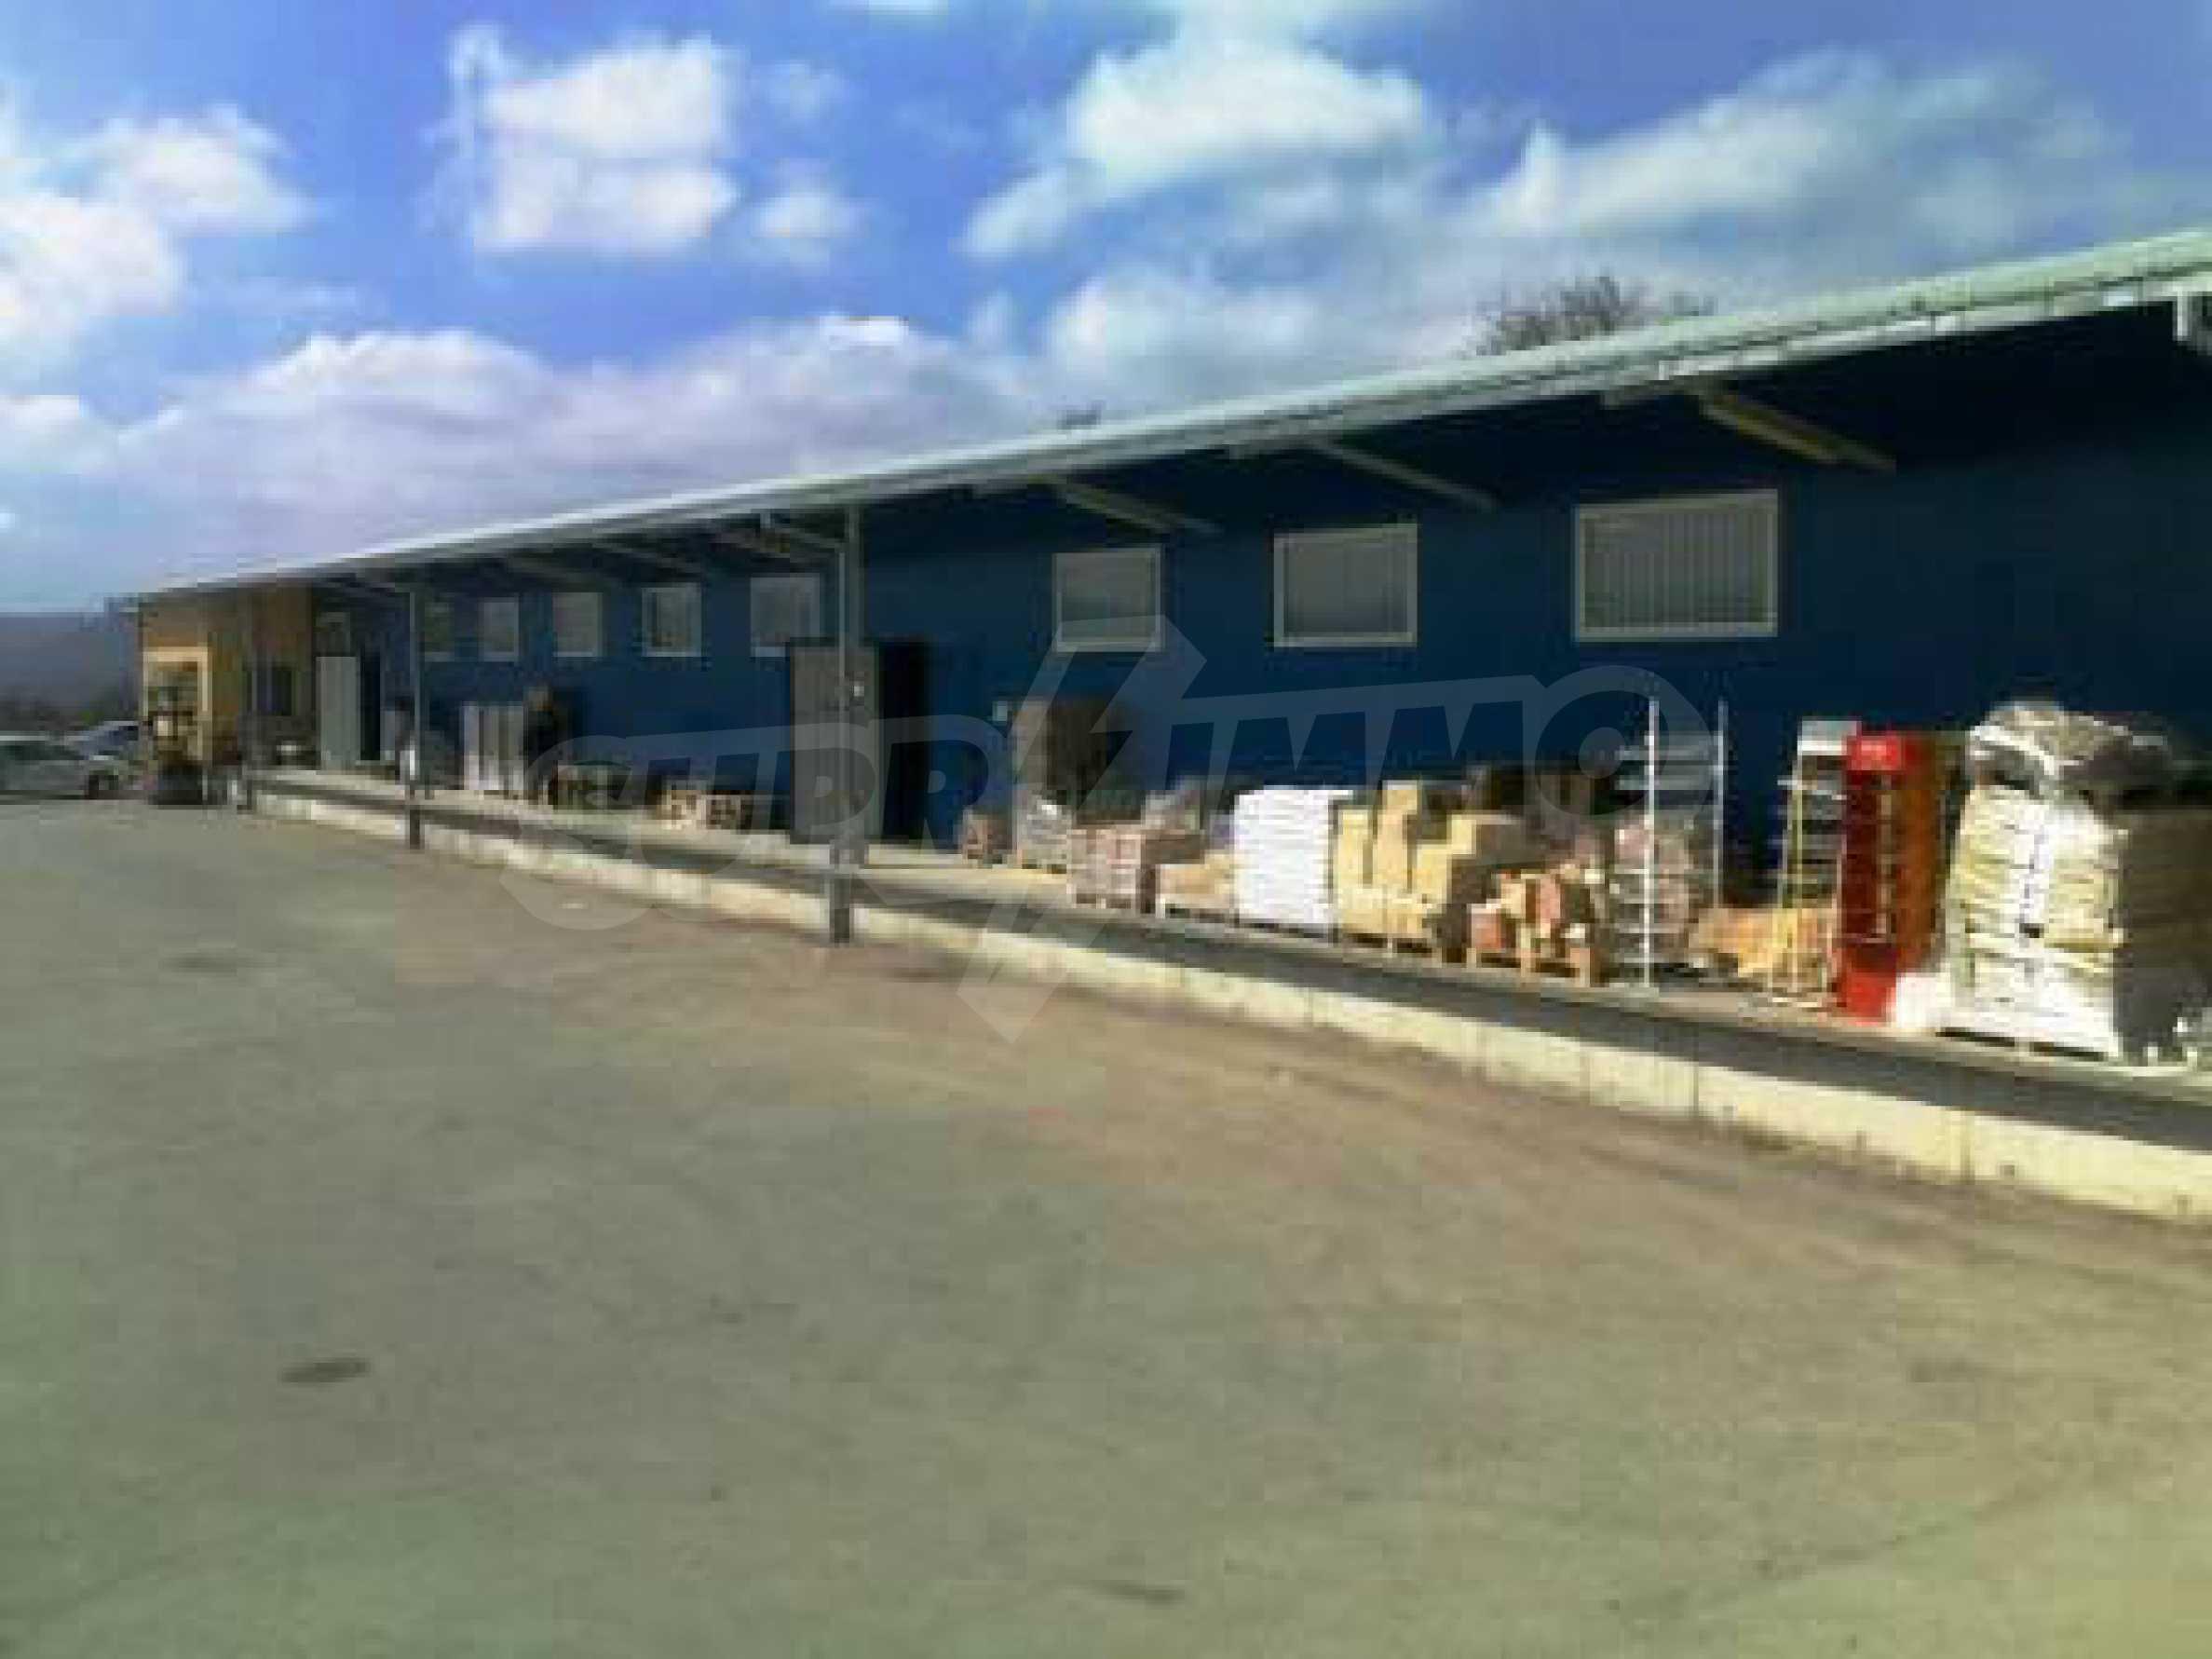 Warehouse on the main E85 road, Rousse-Svilengrad